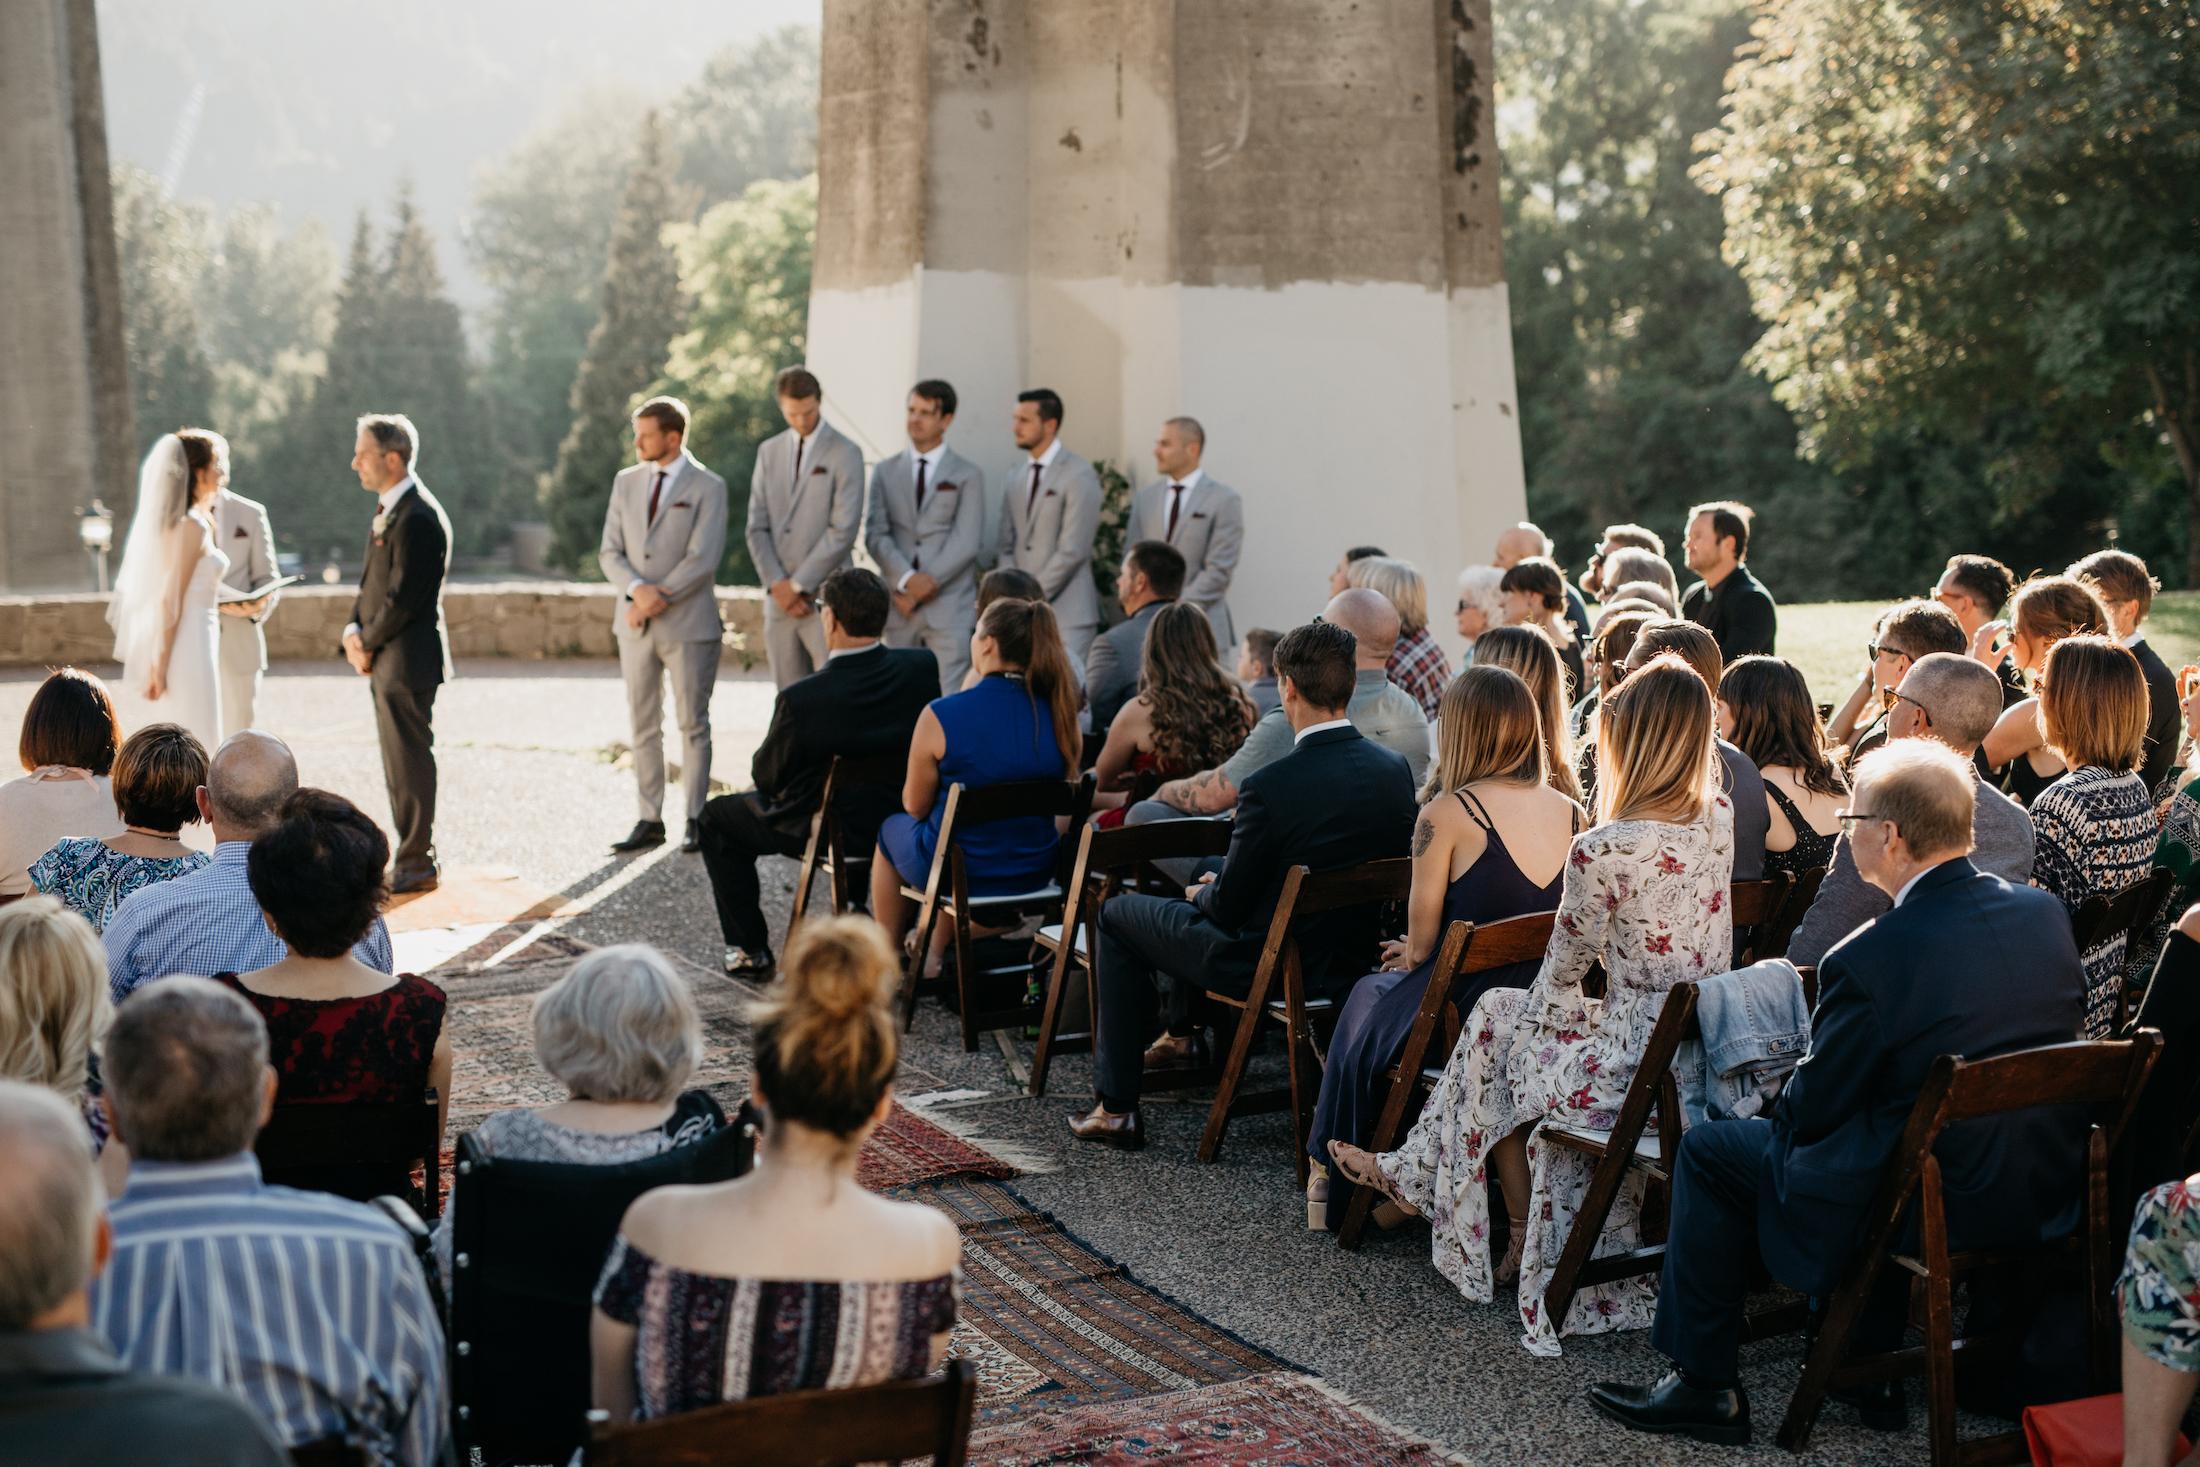 cathedral-park-portland-wedding-photographer-baker-building-wedding455.jpg